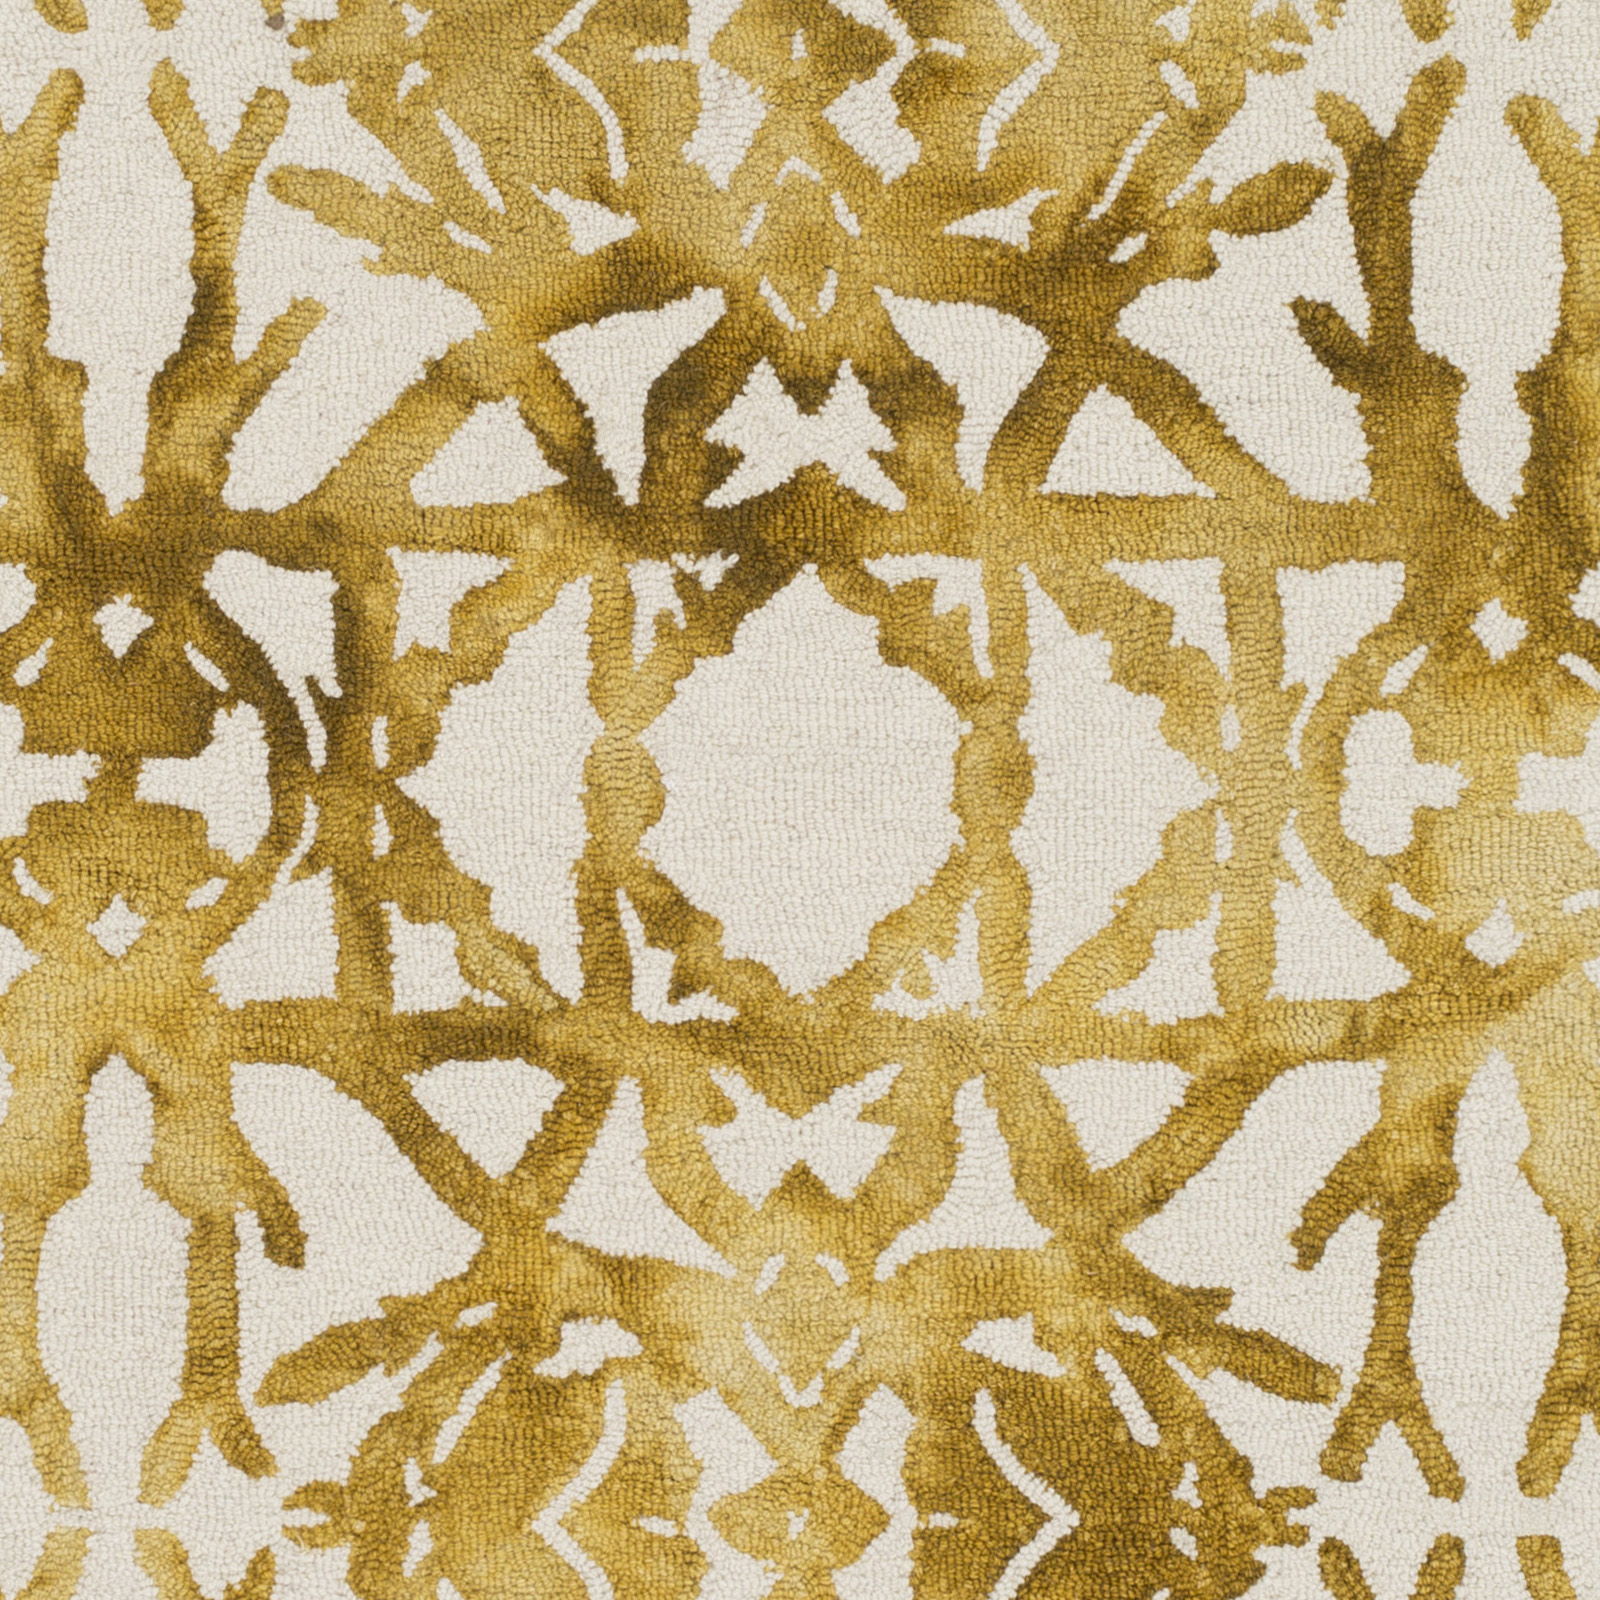 Artistic Weavers Organic Awog 2299 Avery Gold Off White Rug